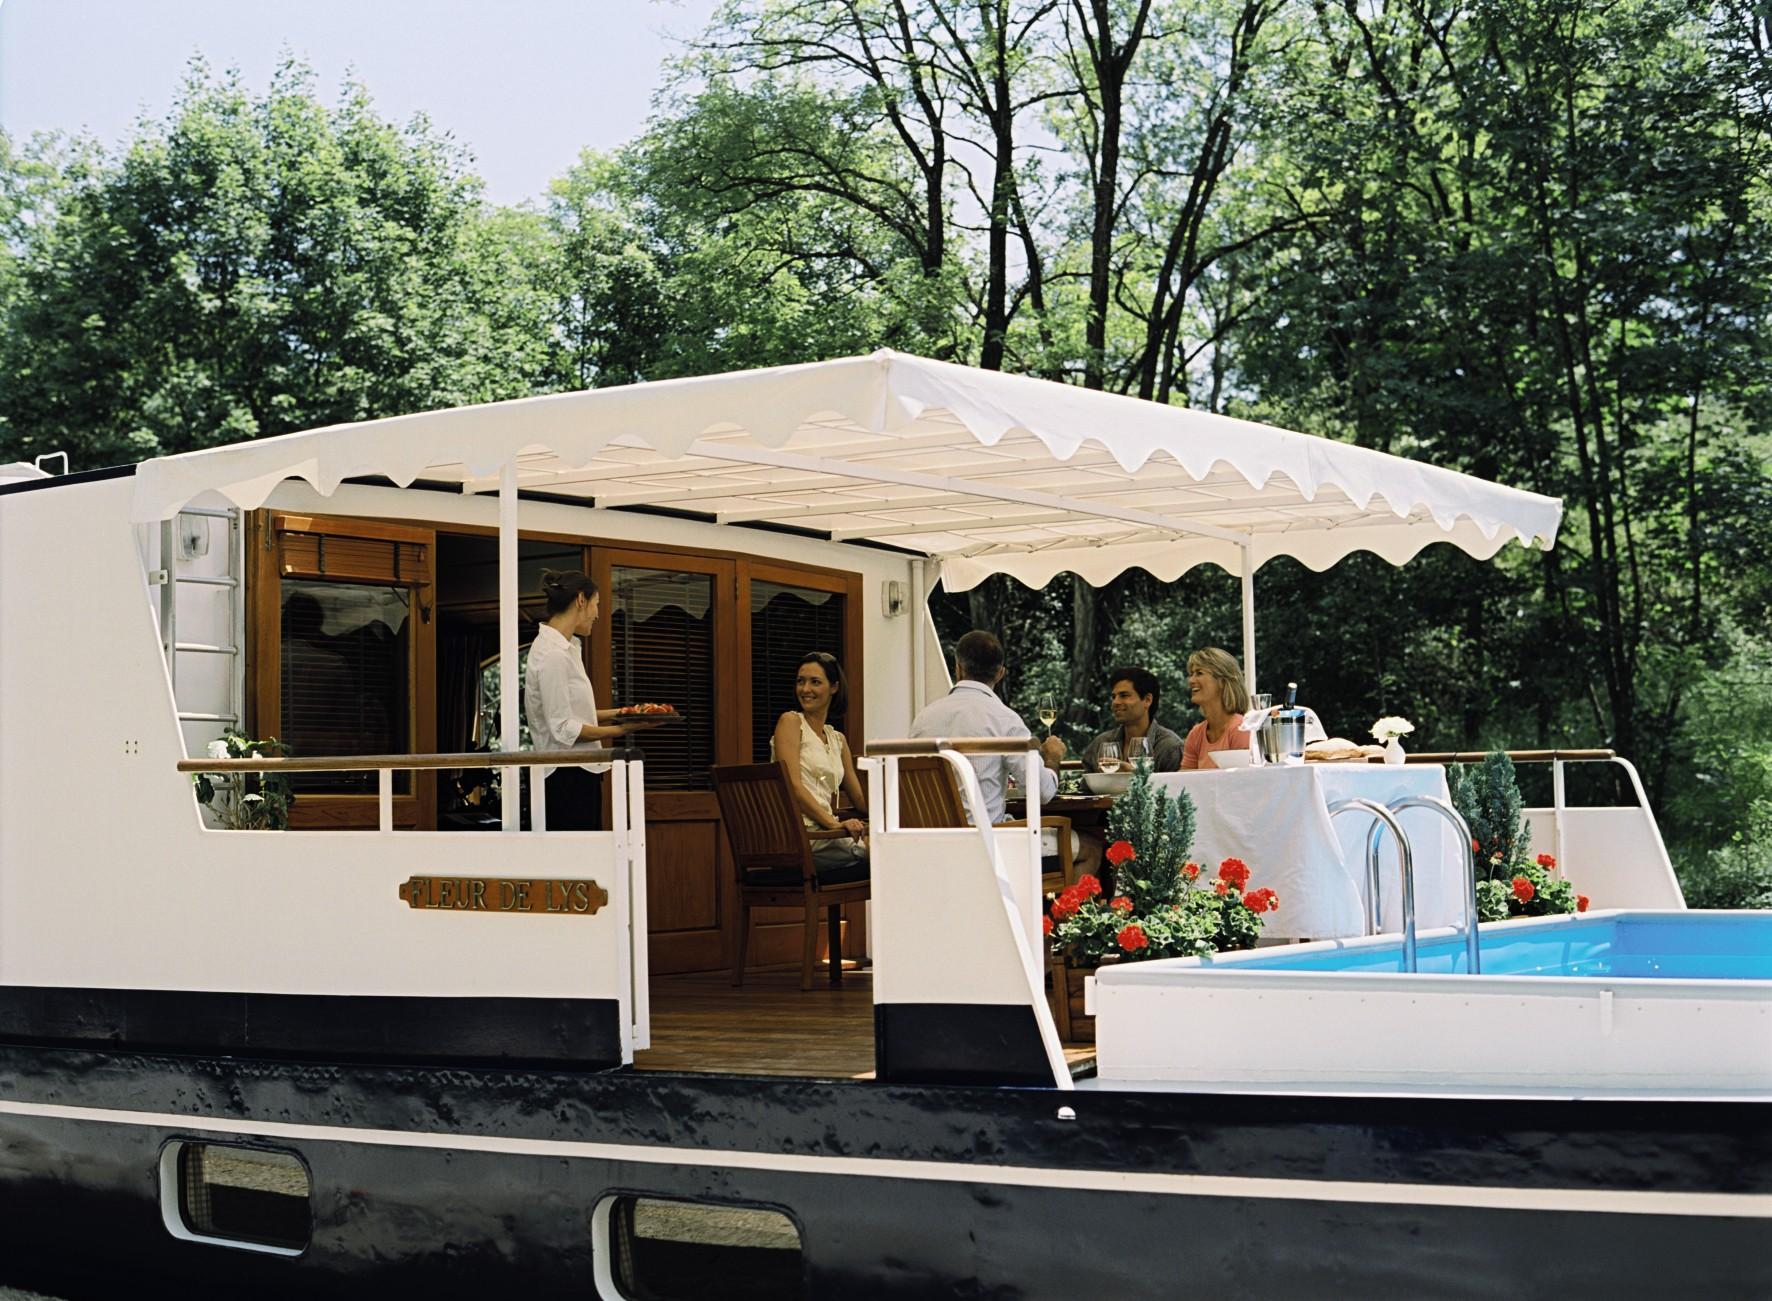 Belmond River Cruises Belmond Fleur de Lys Exterior Restaurant Lunch 1.jpg